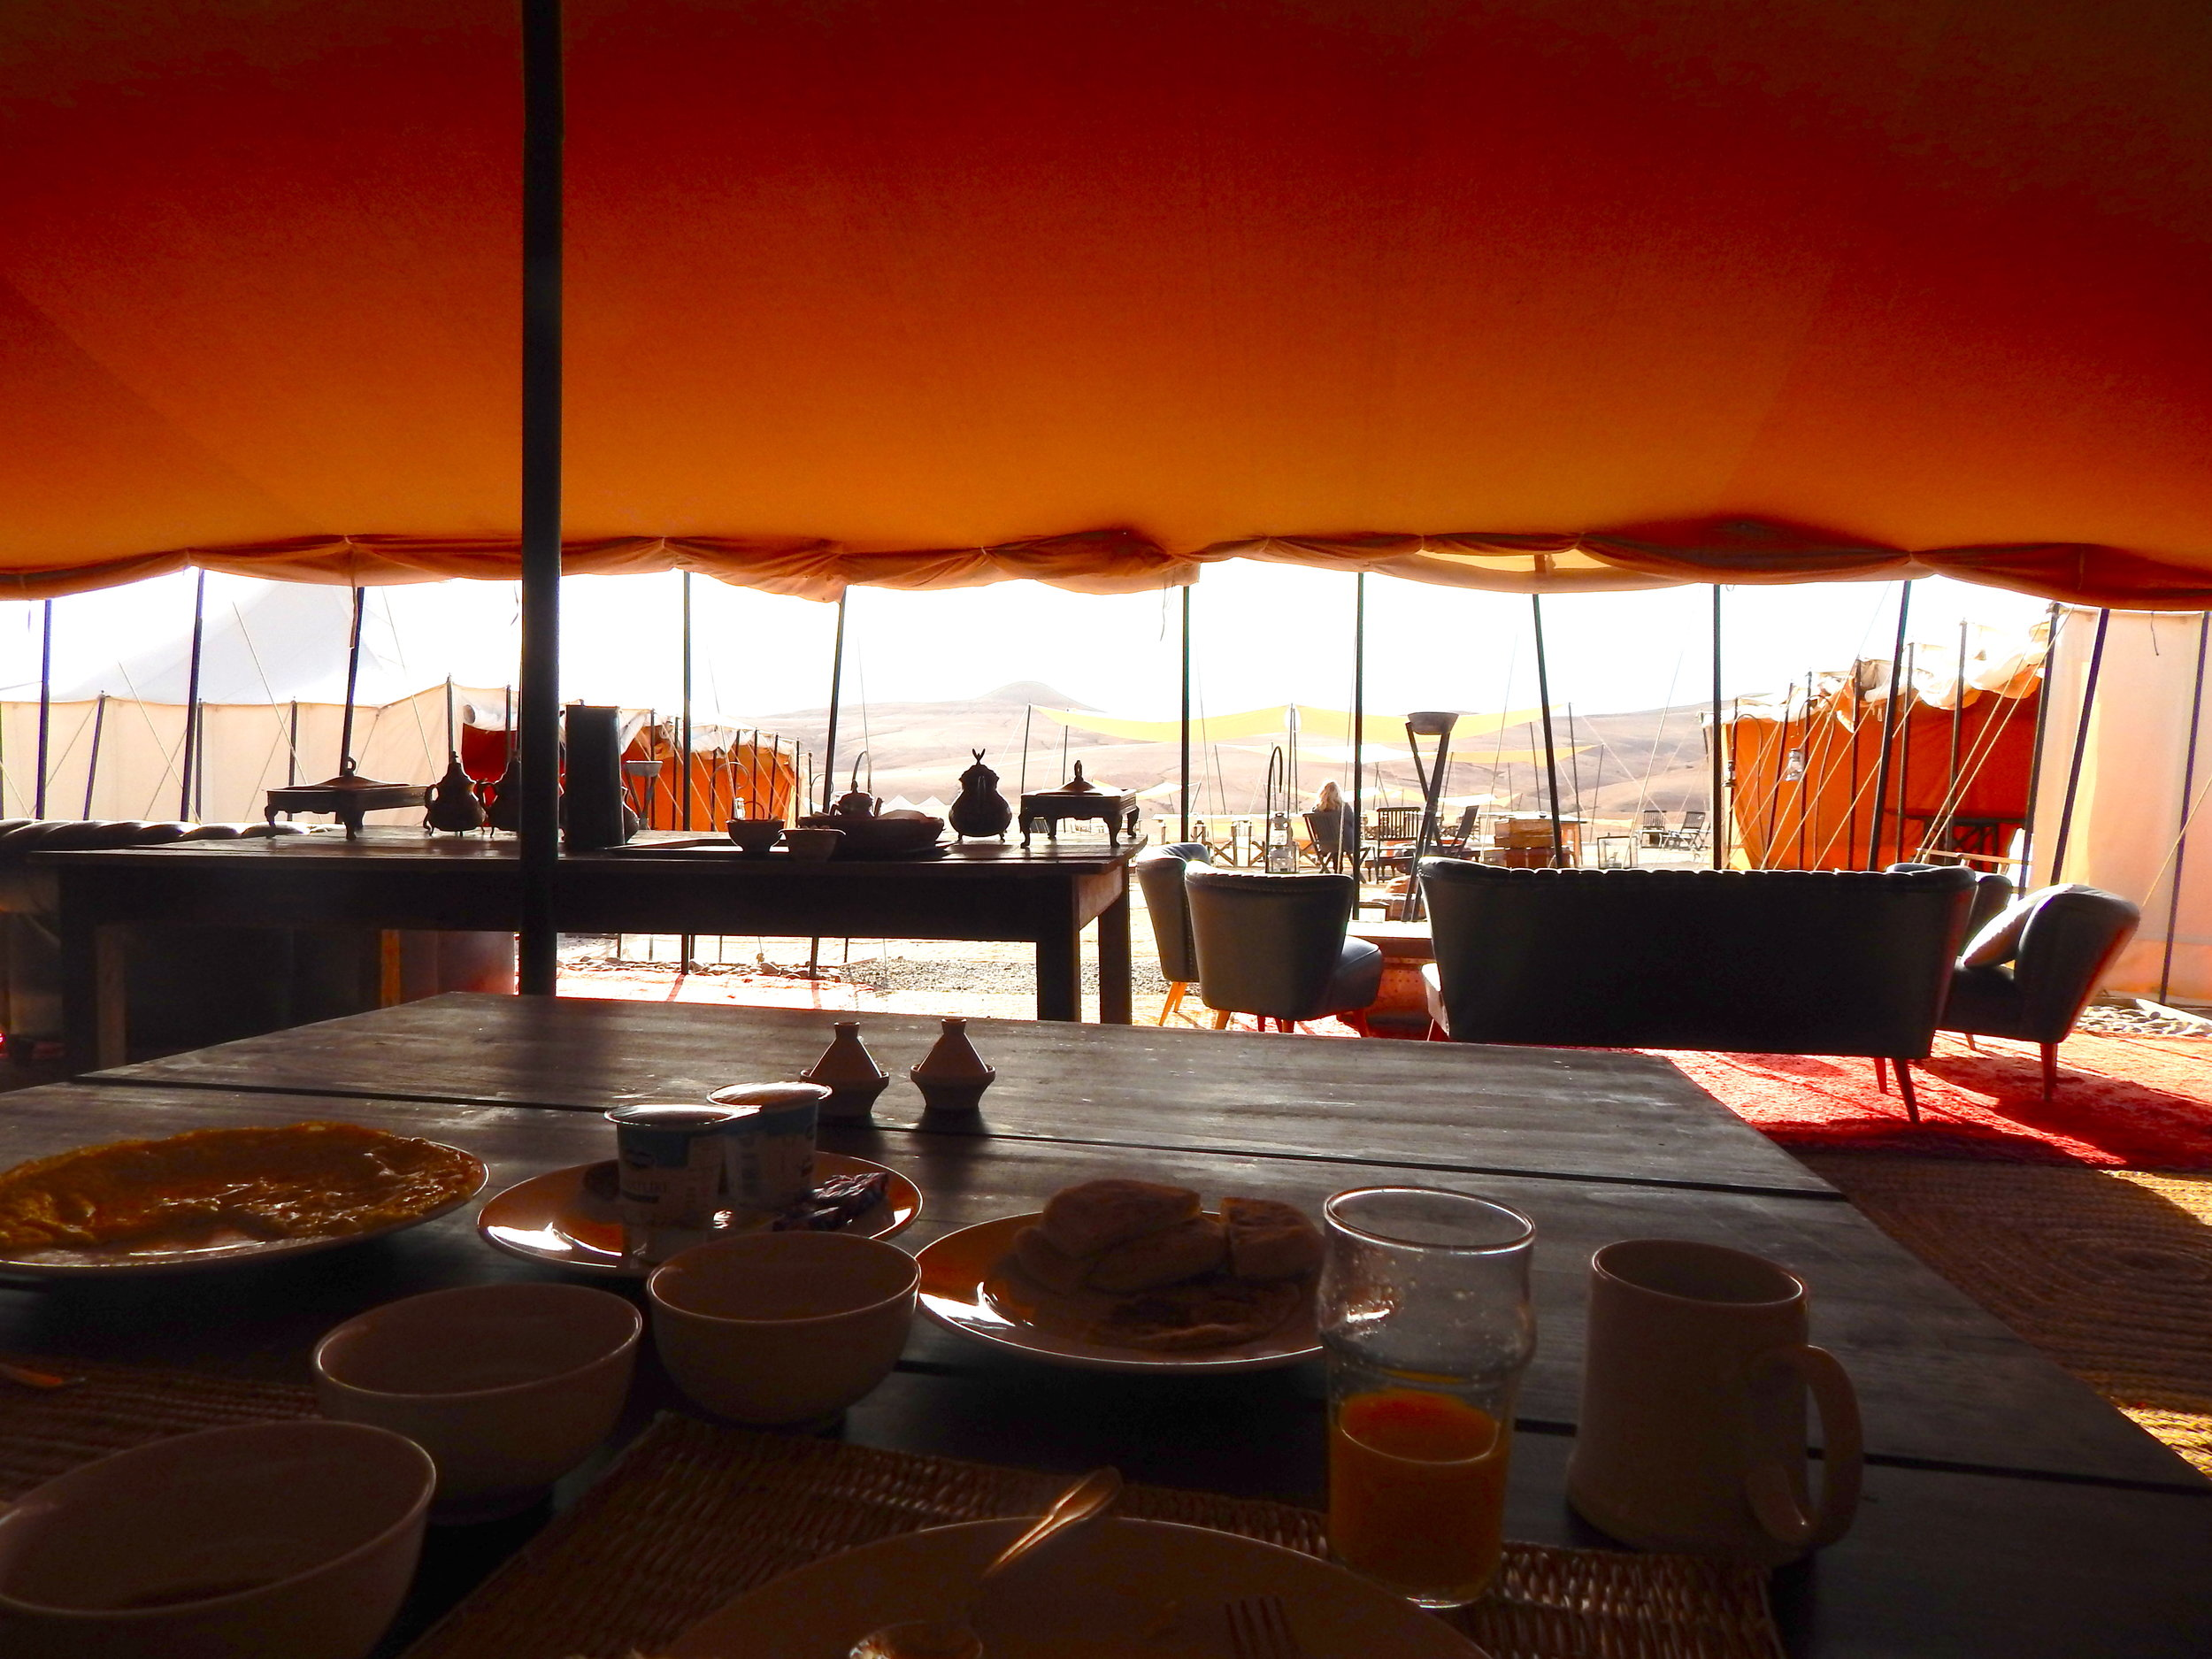 Breakfast overlooking the stone desert.